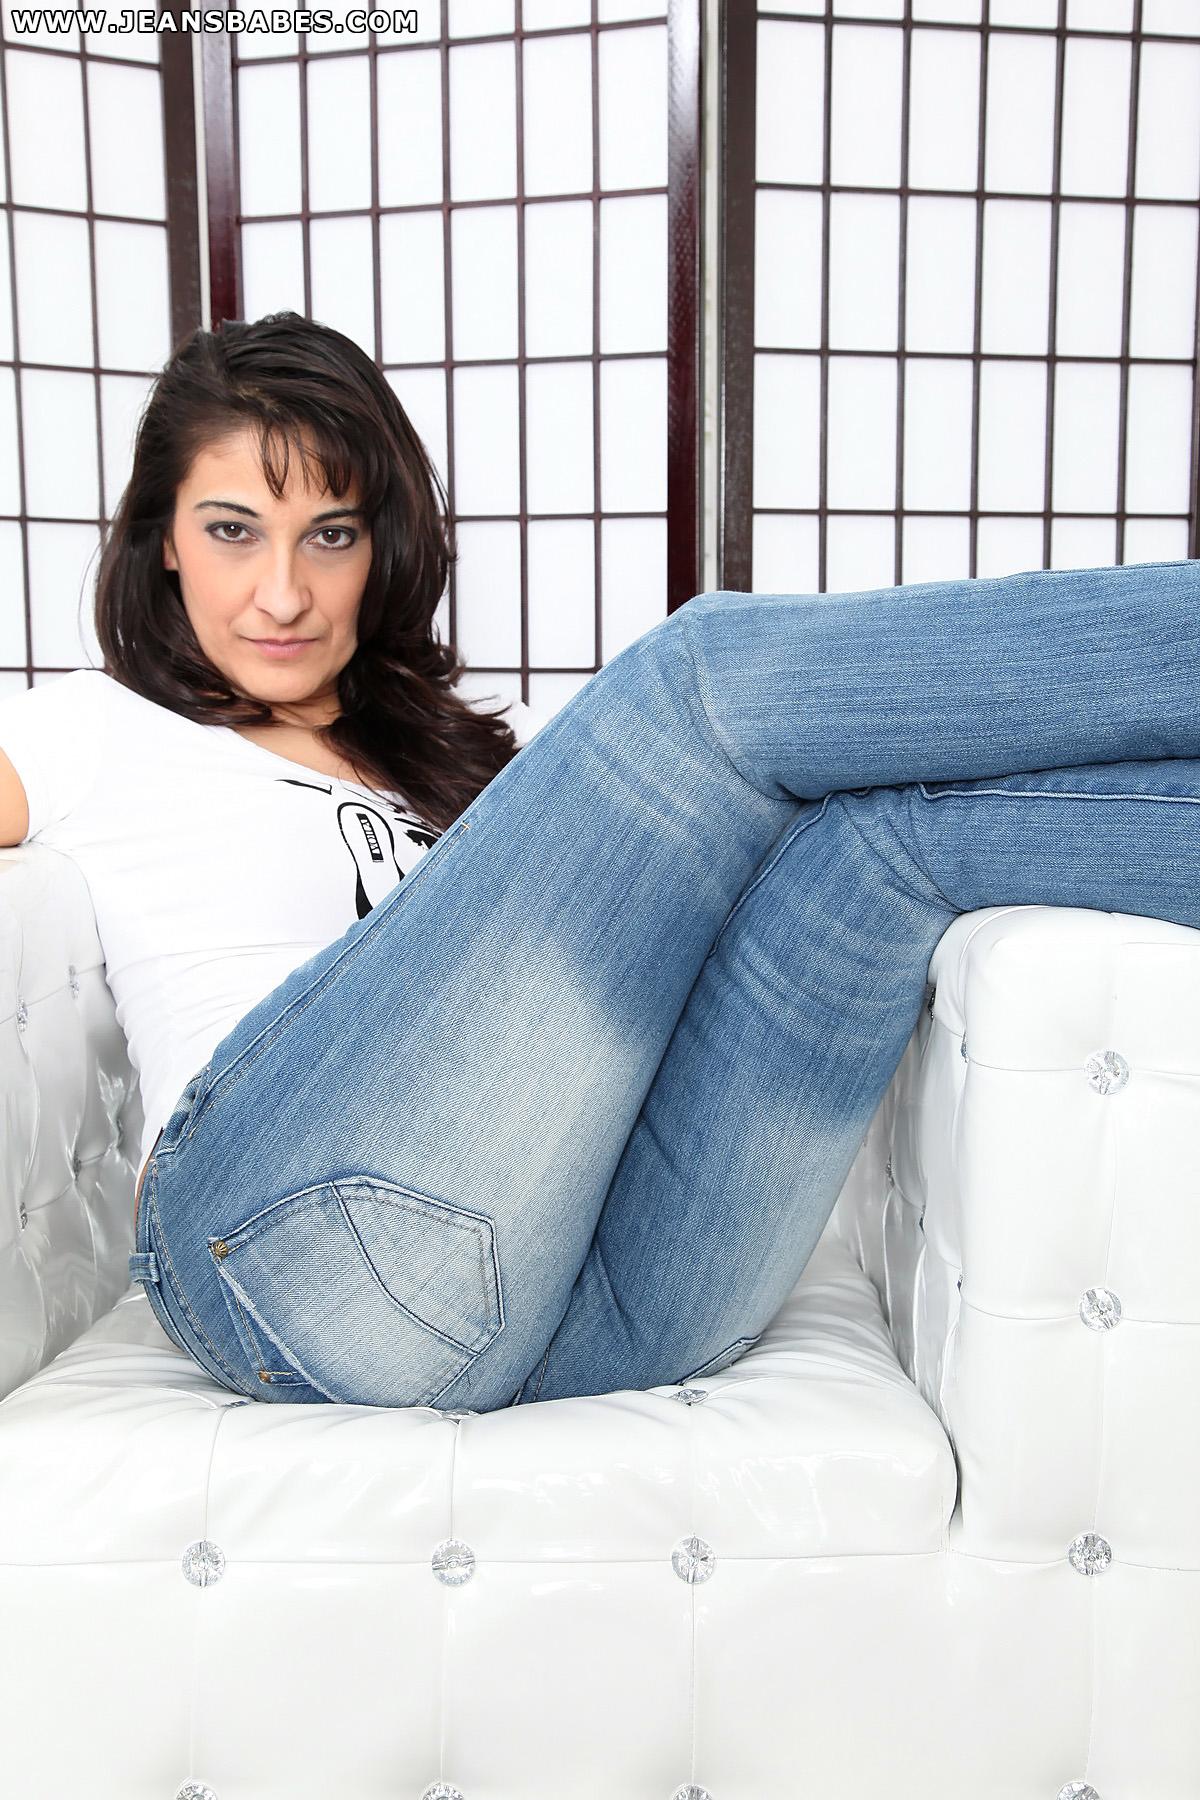 Hot milfs in jeans